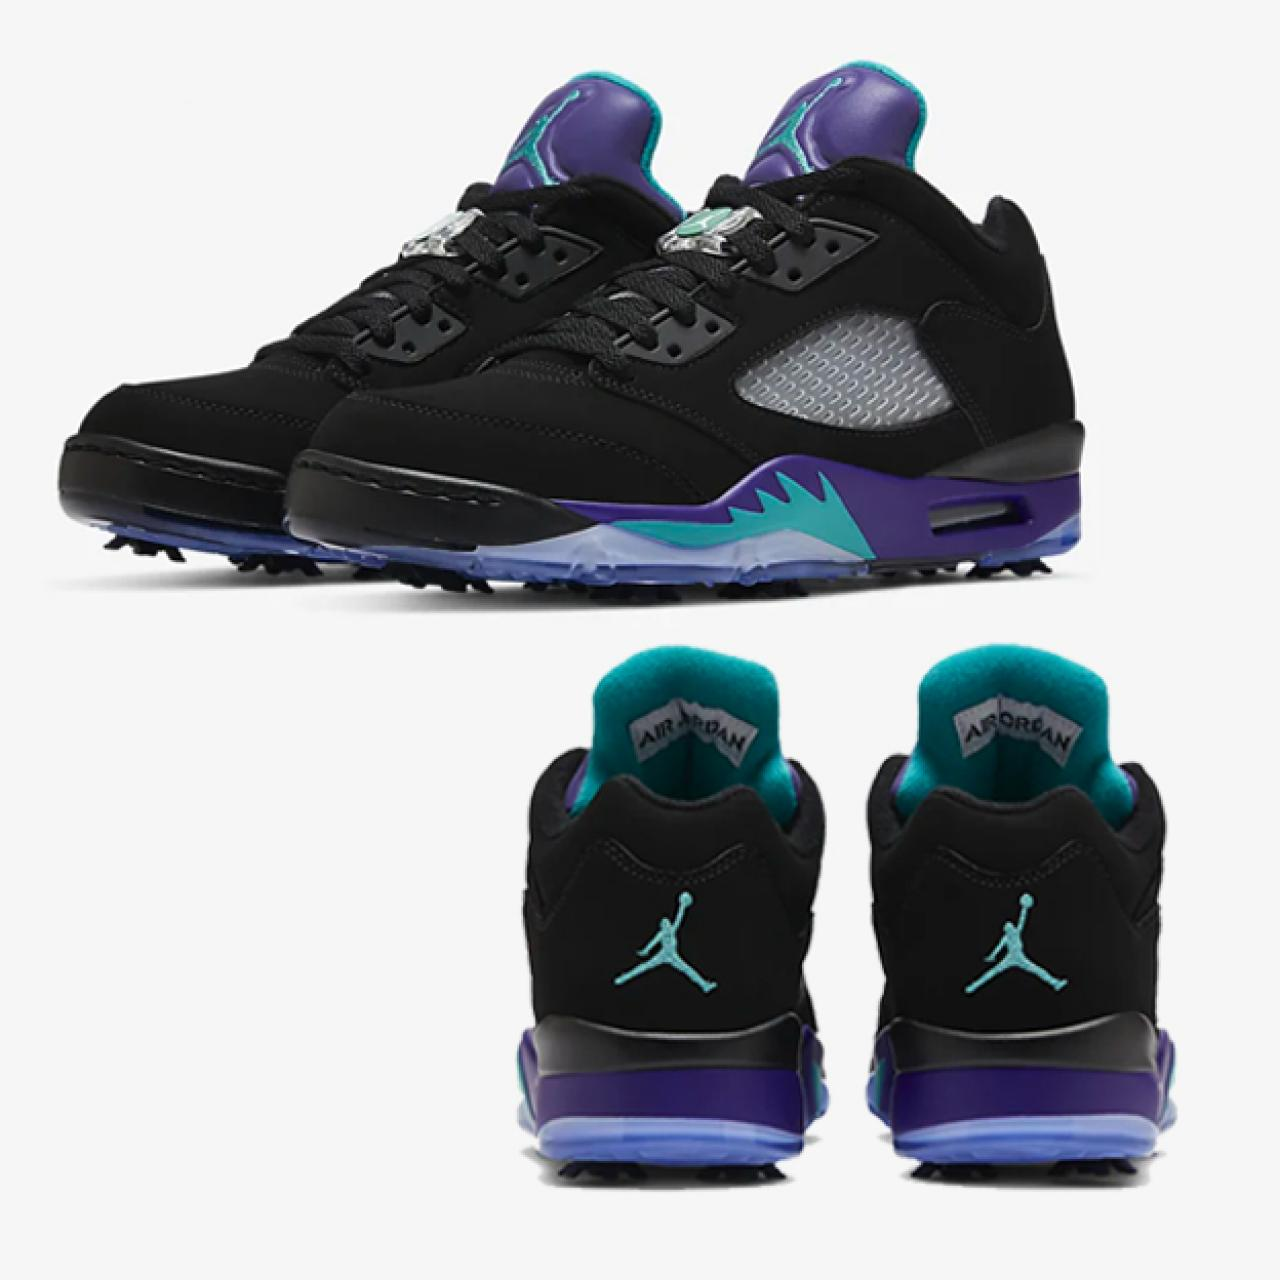 The new 'Purple Grape' Air Jordan 5 Golf Shoes are finally ...